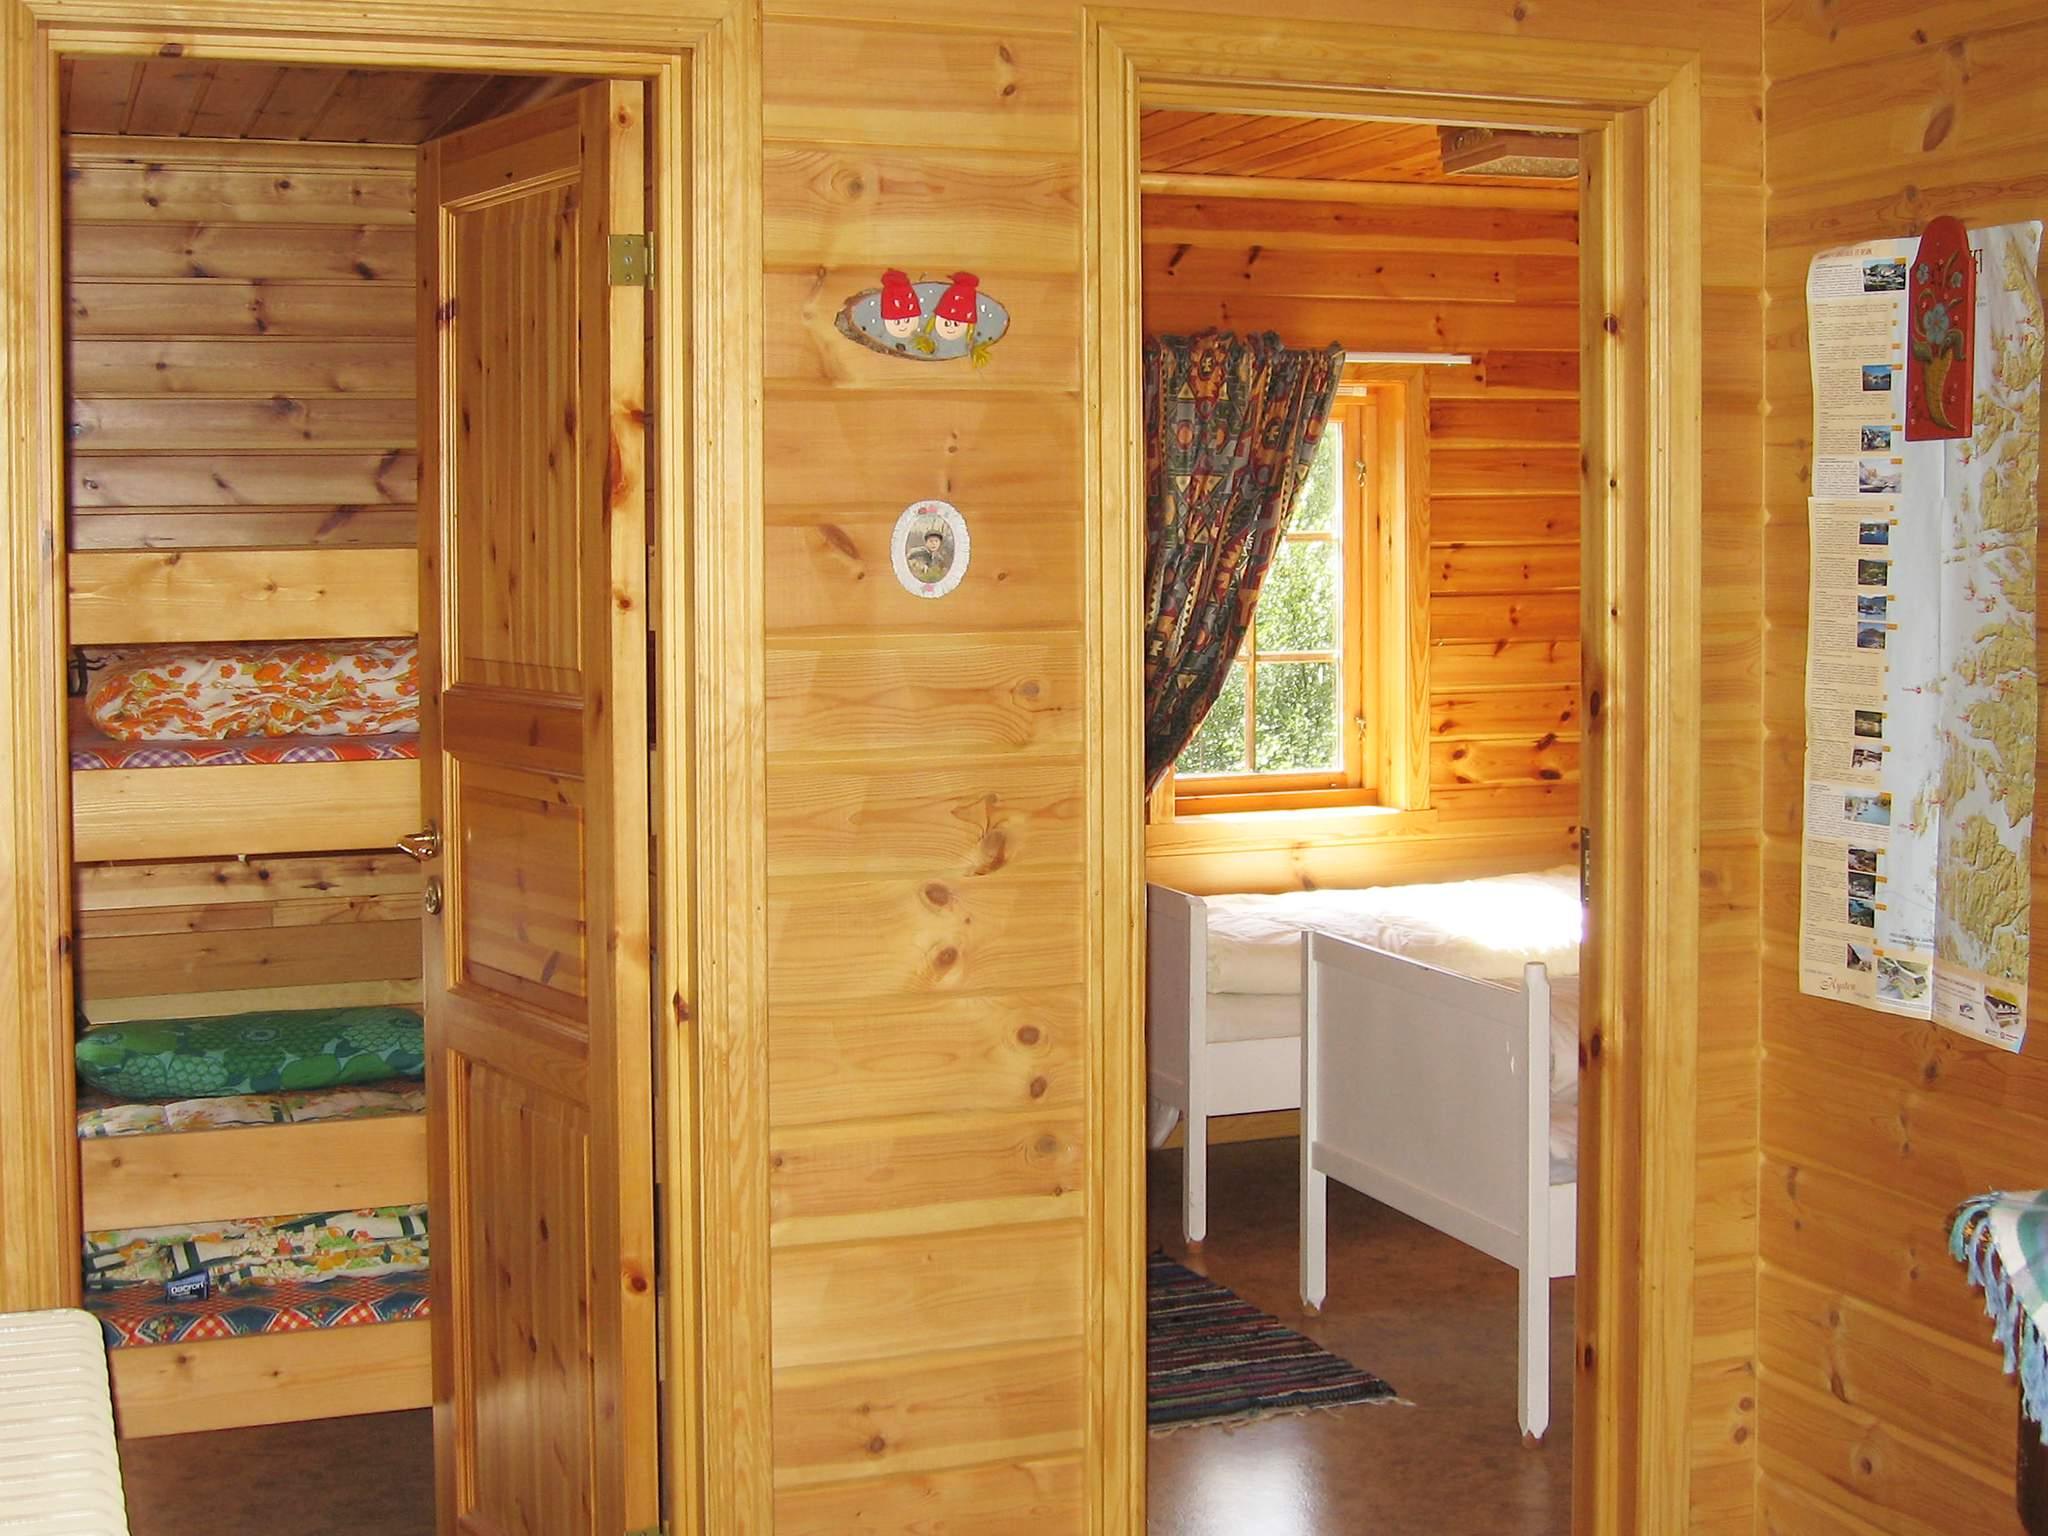 Ferienhaus Helle (82342), Naustdal, Sognefjord - Nordfjord, Westnorwegen, Norwegen, Bild 6